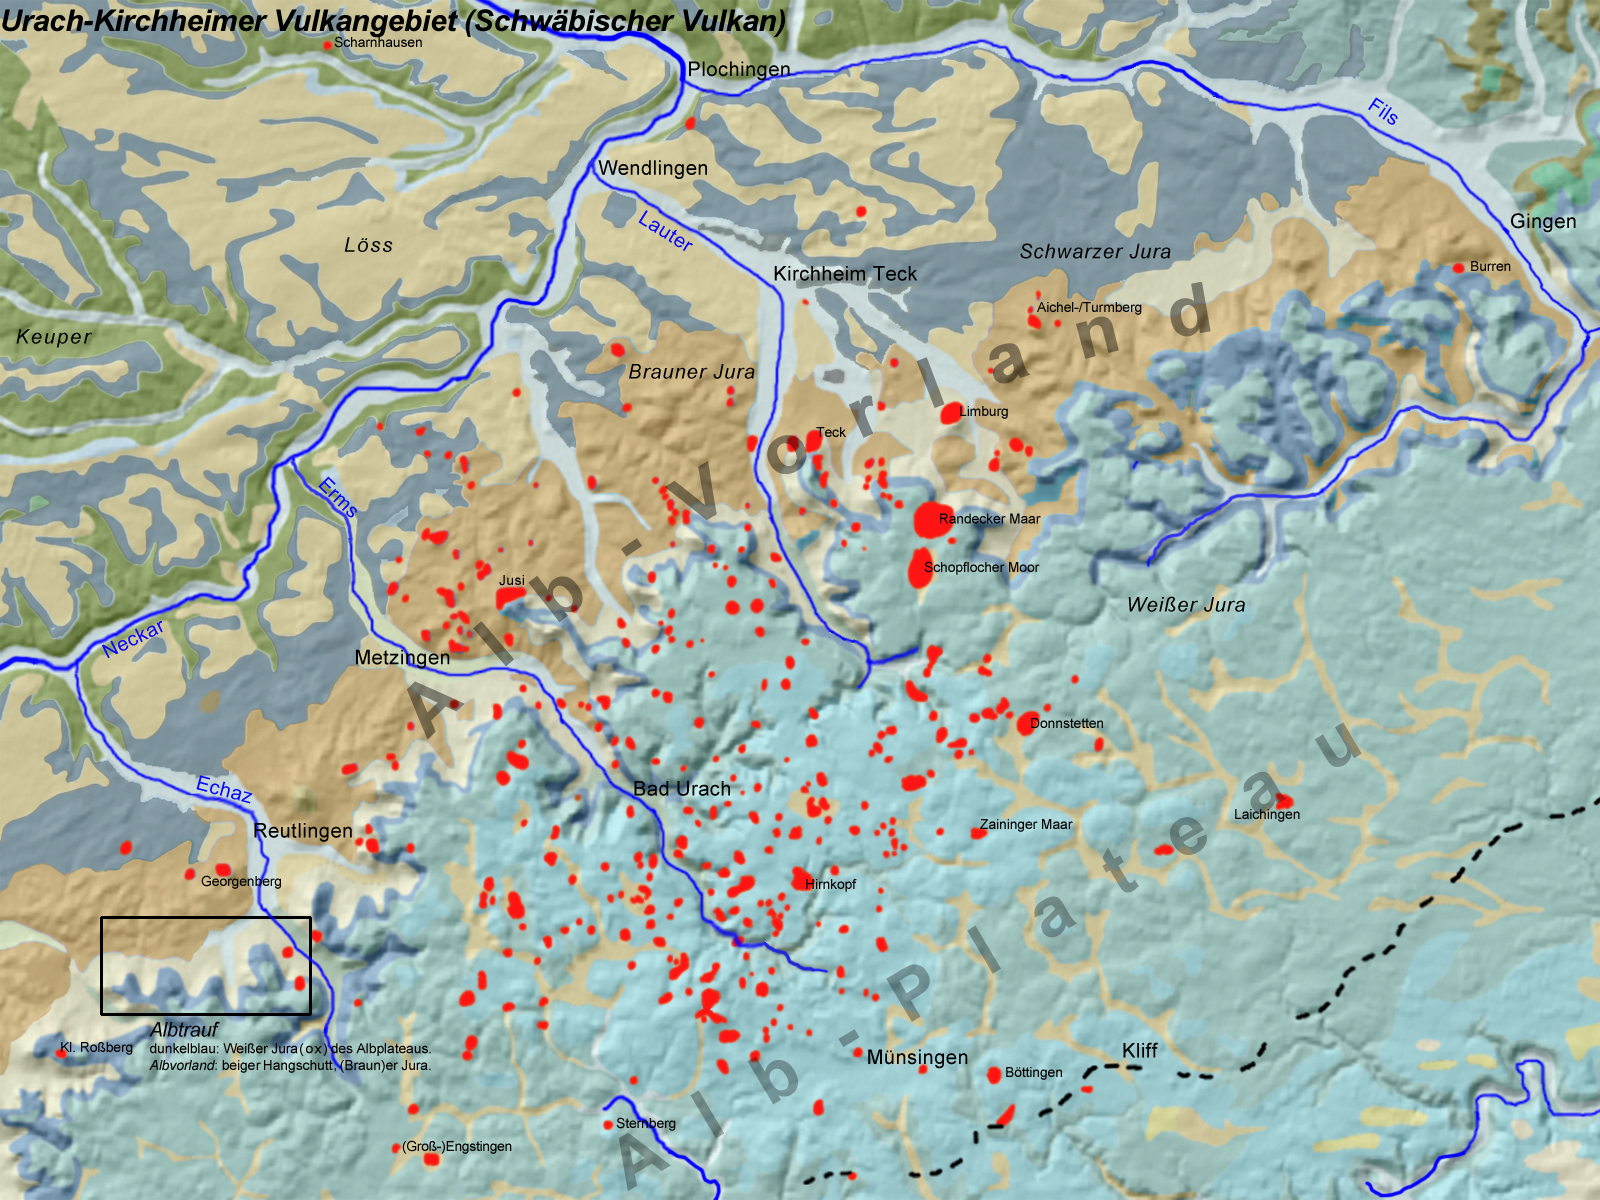 Vulkane Der Erde Karte.Schwäbischer Vulkan Wikipedia